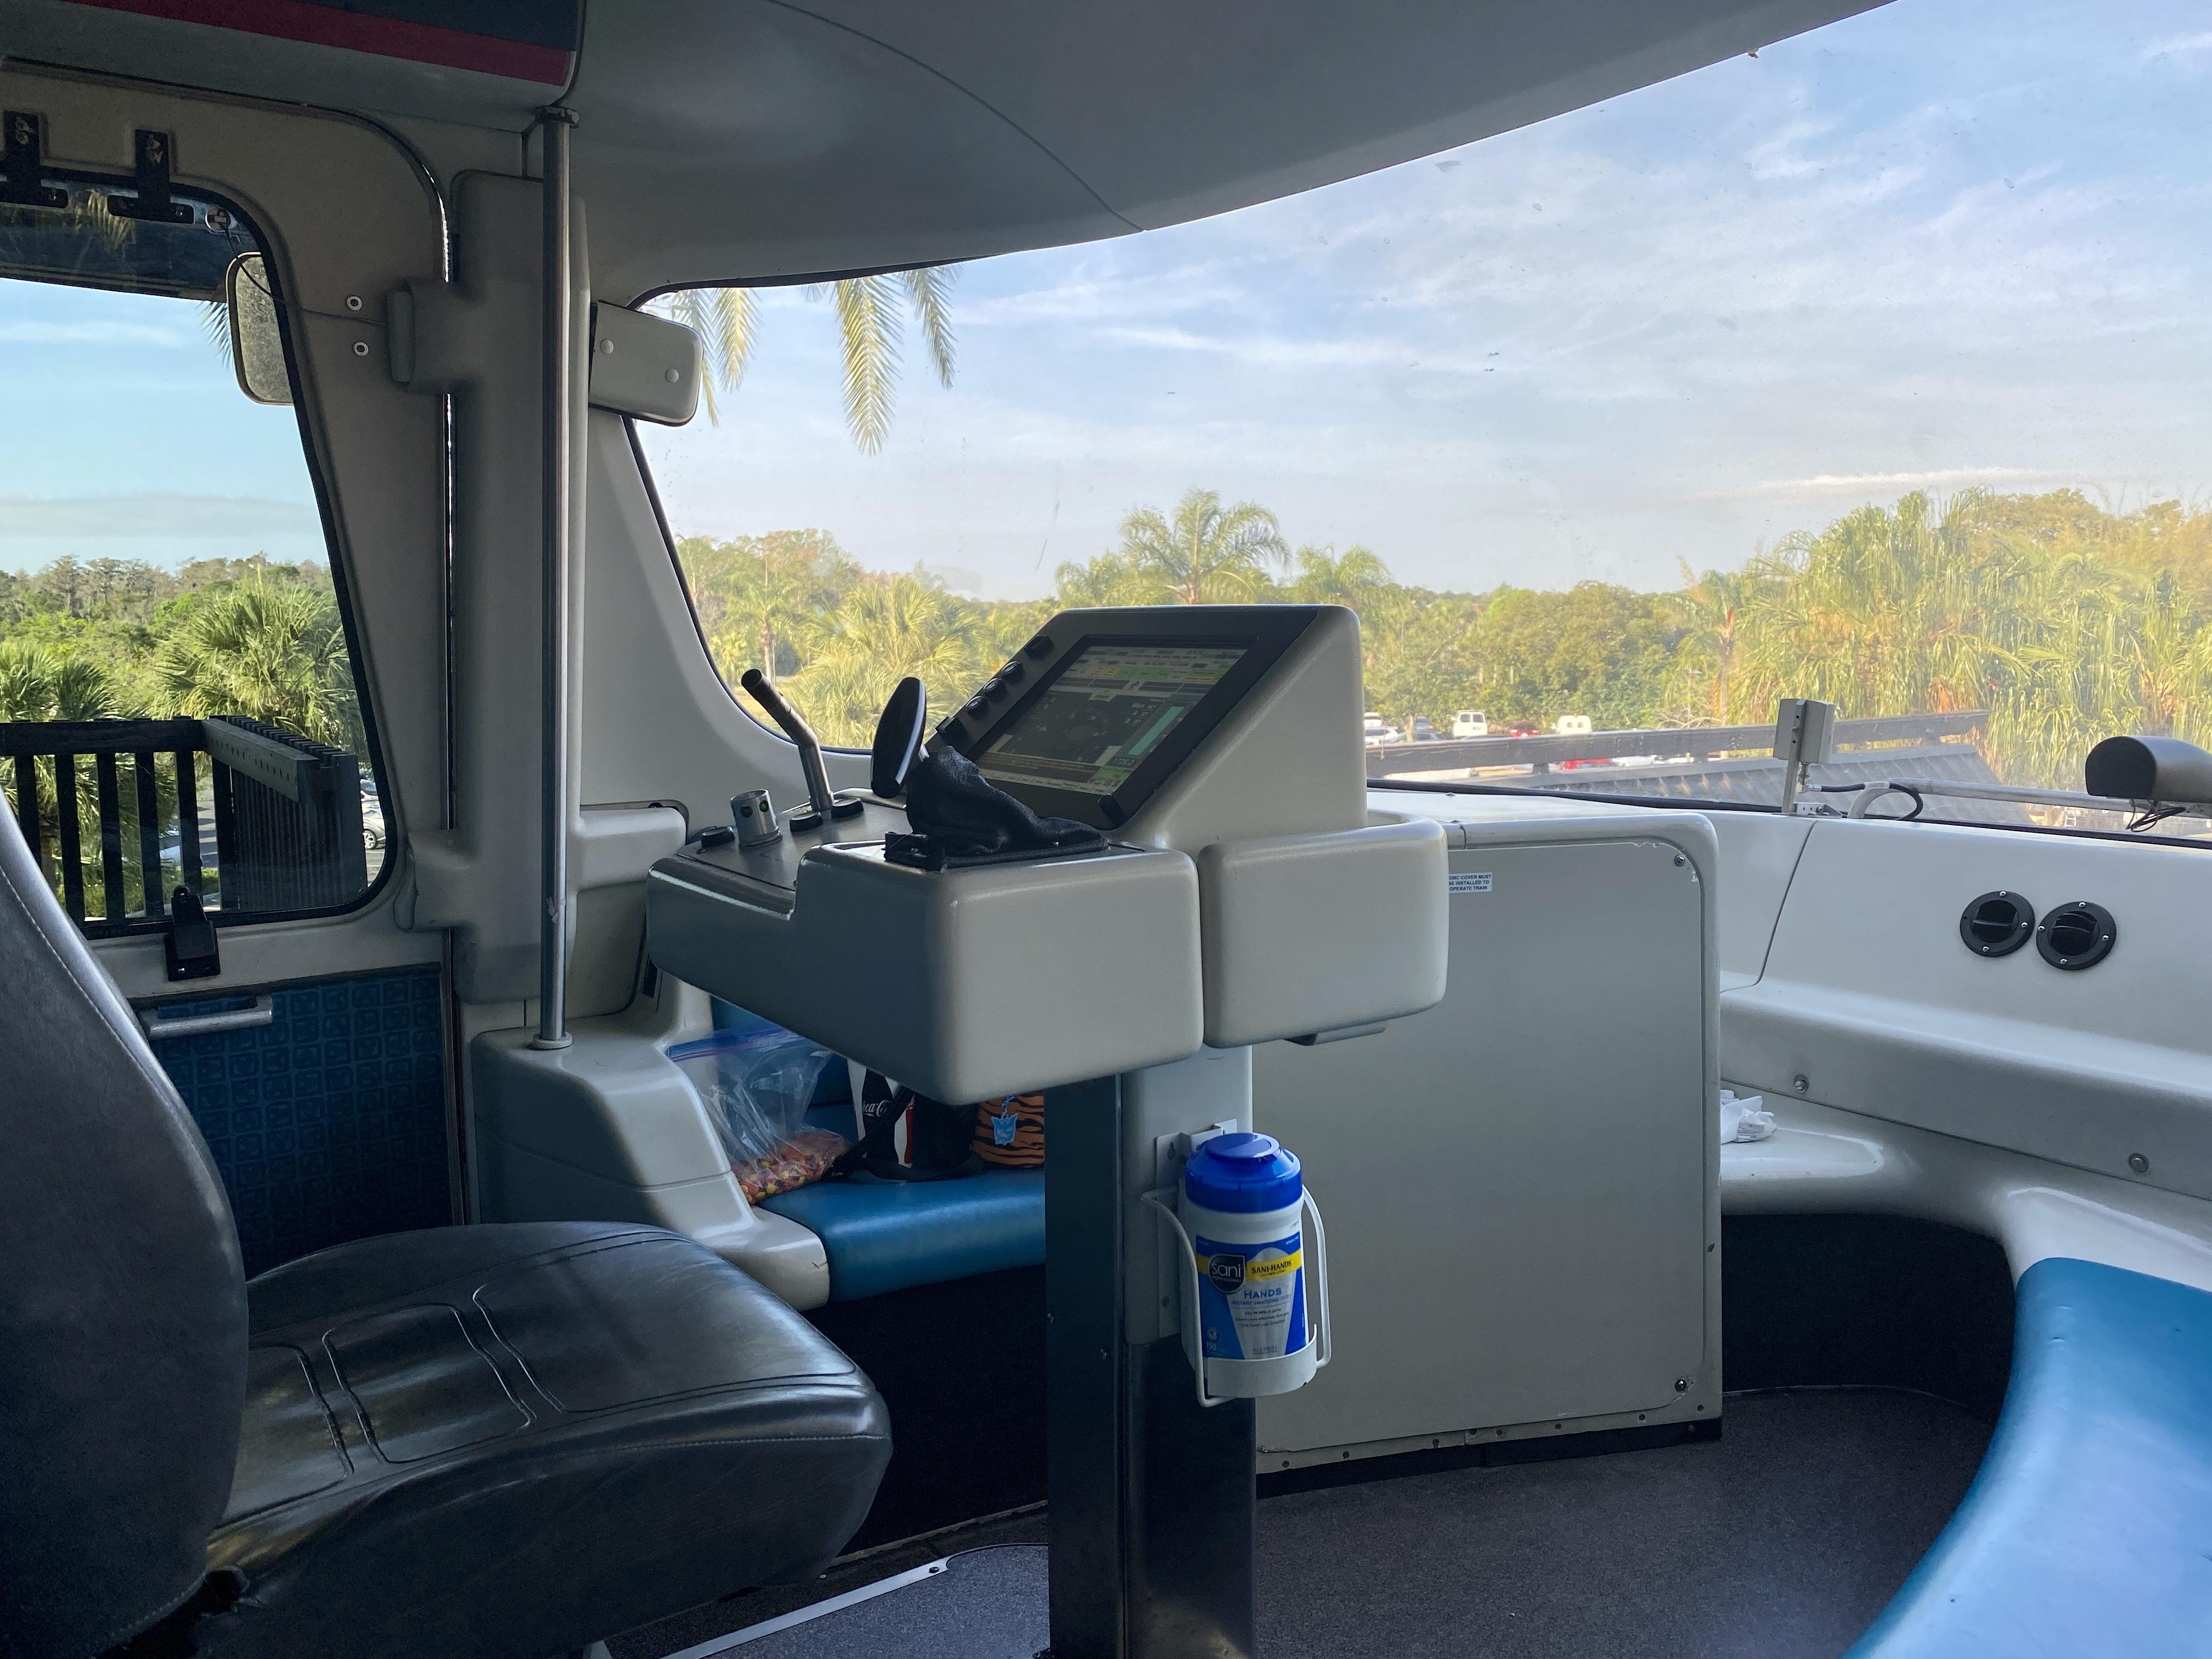 Monorail driver control